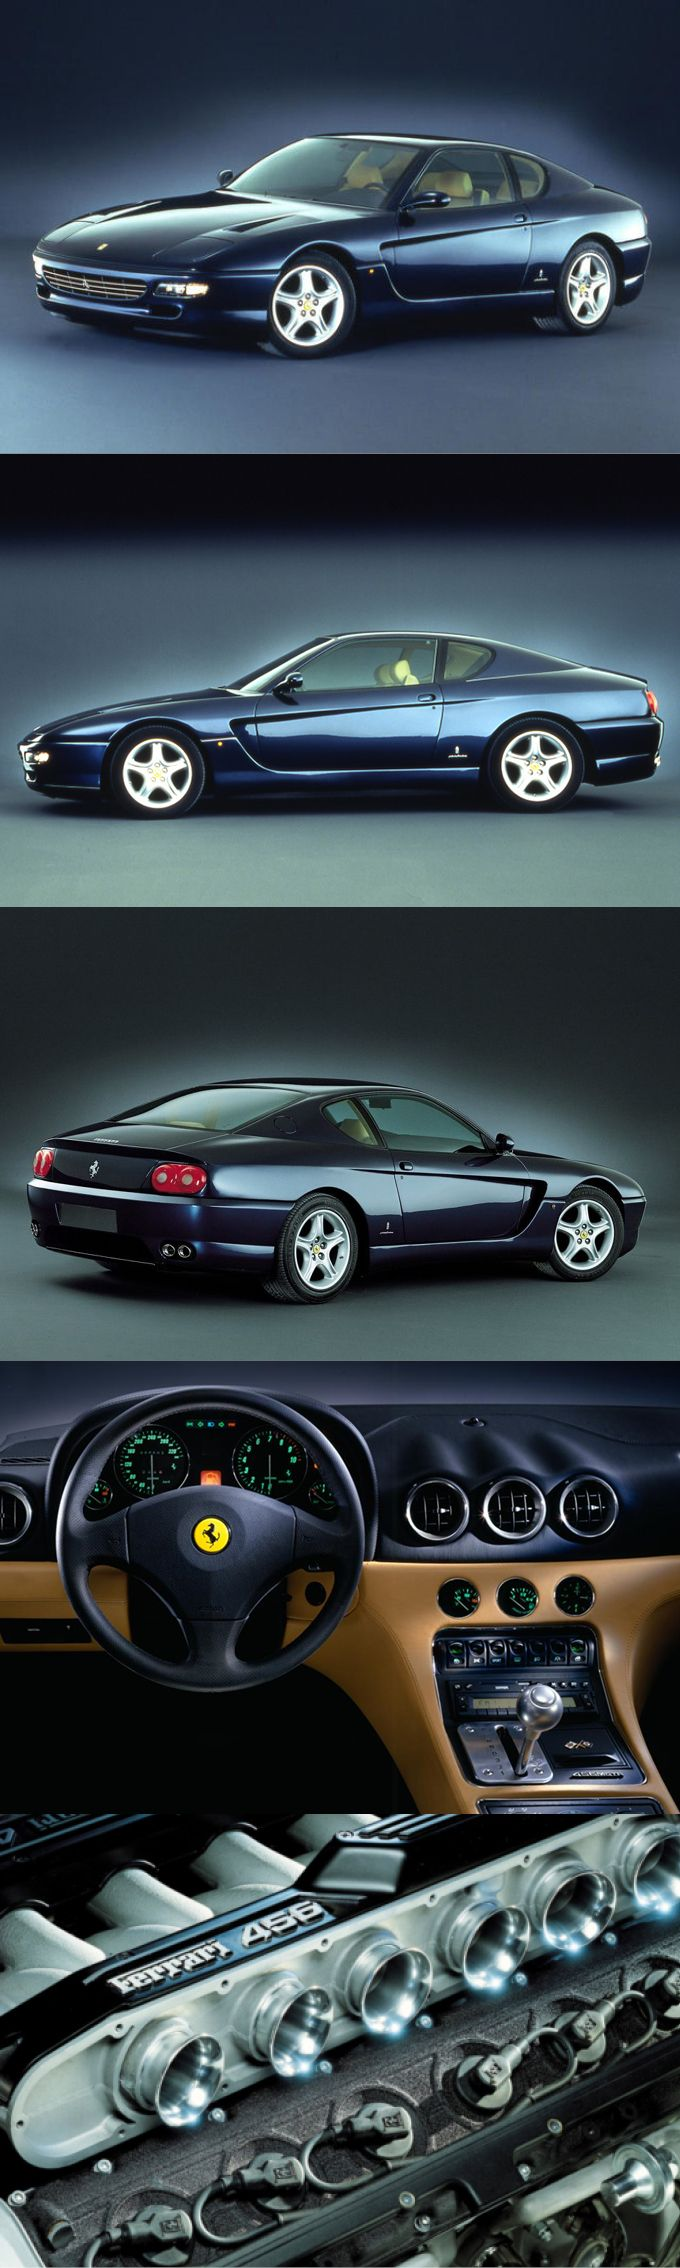 1992 Ferrari 456 GT / 436hp V12 / Lorenzo Ramaciotta @ Pininfarina / Italy / blue